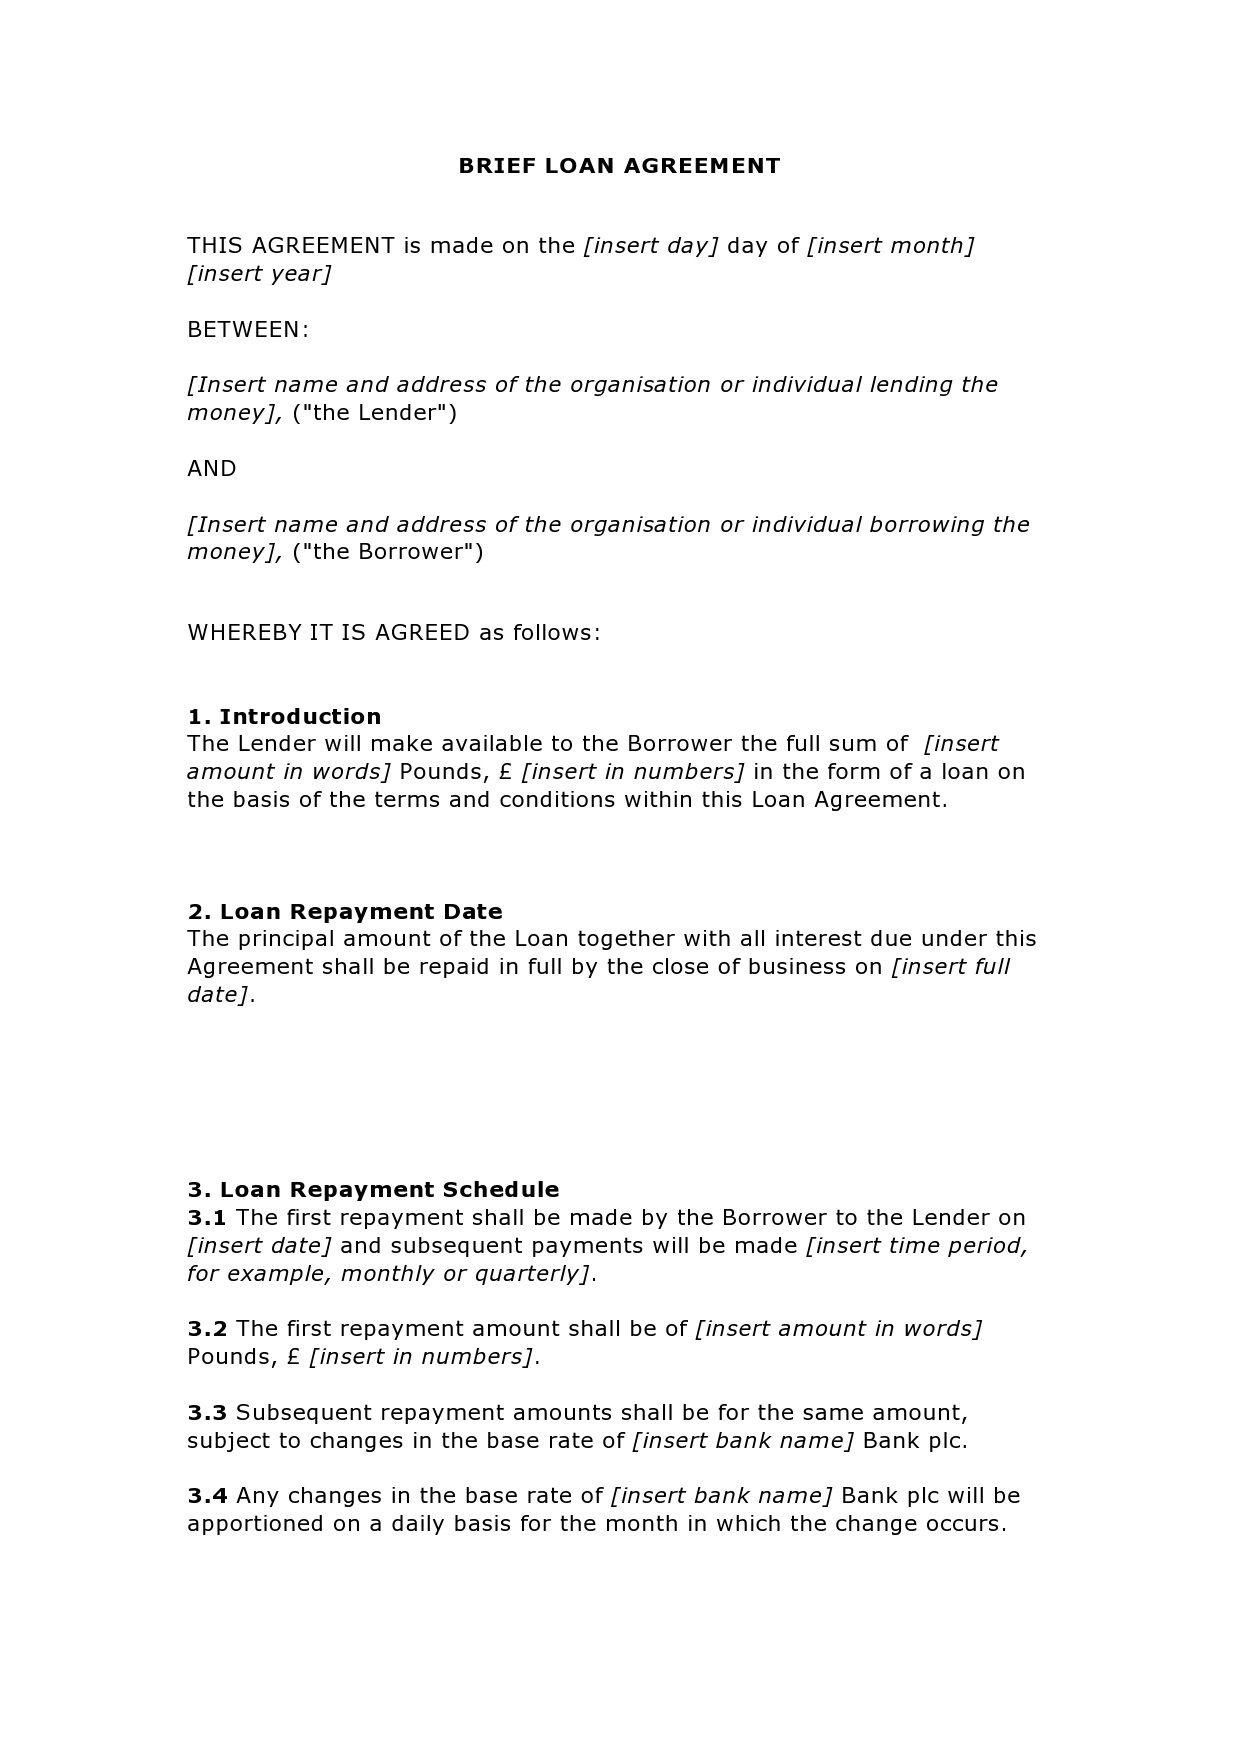 003 Sensational Free Family Loan Agreement Template Nz Highest Clarity Full